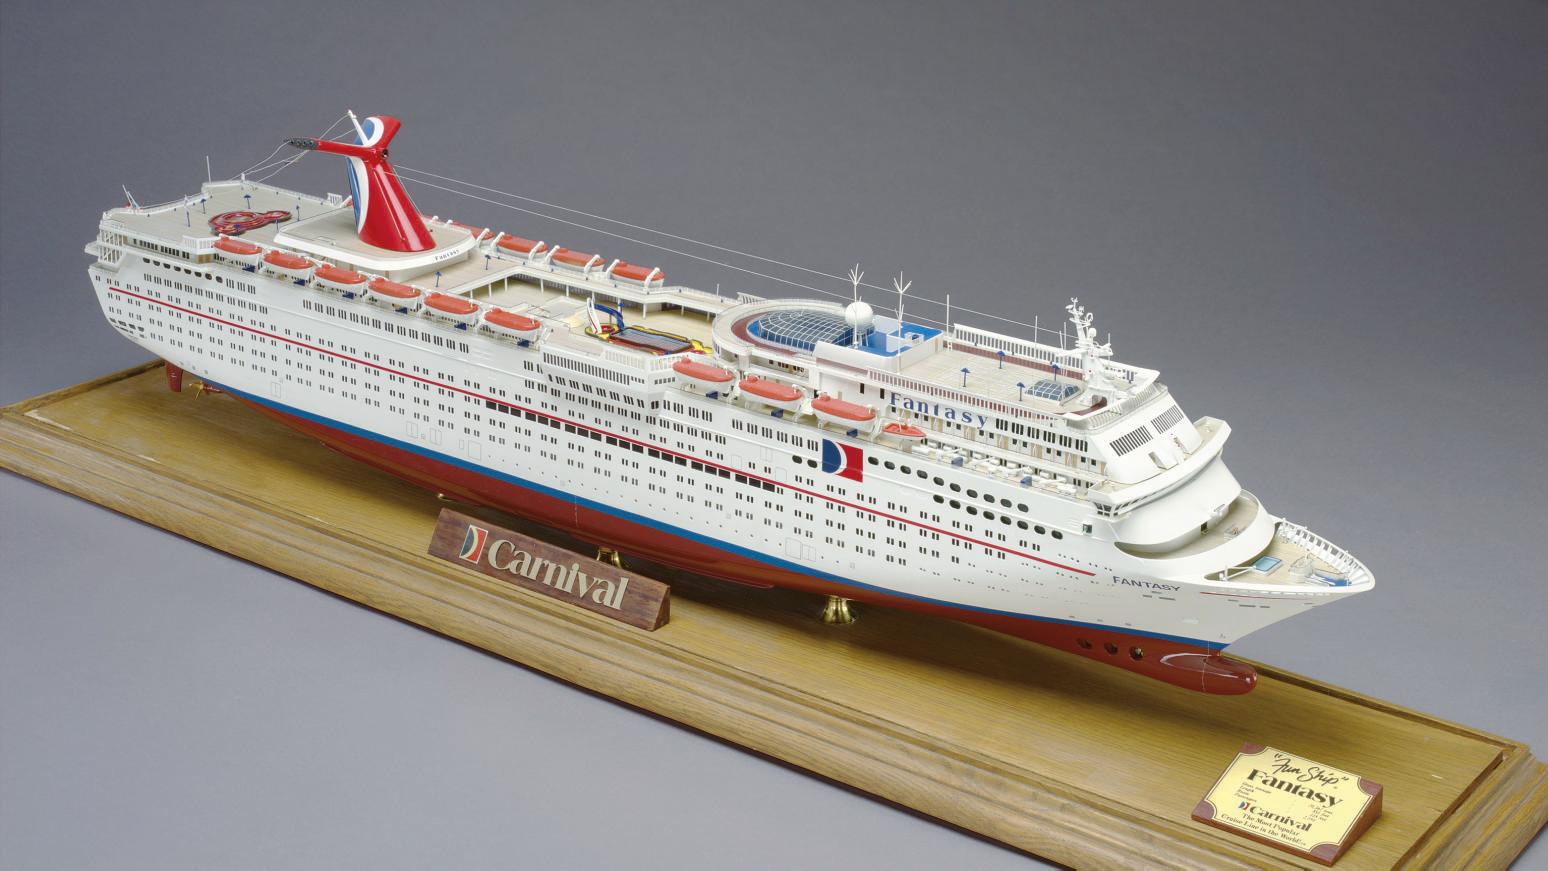 A fine scale model of Carnival